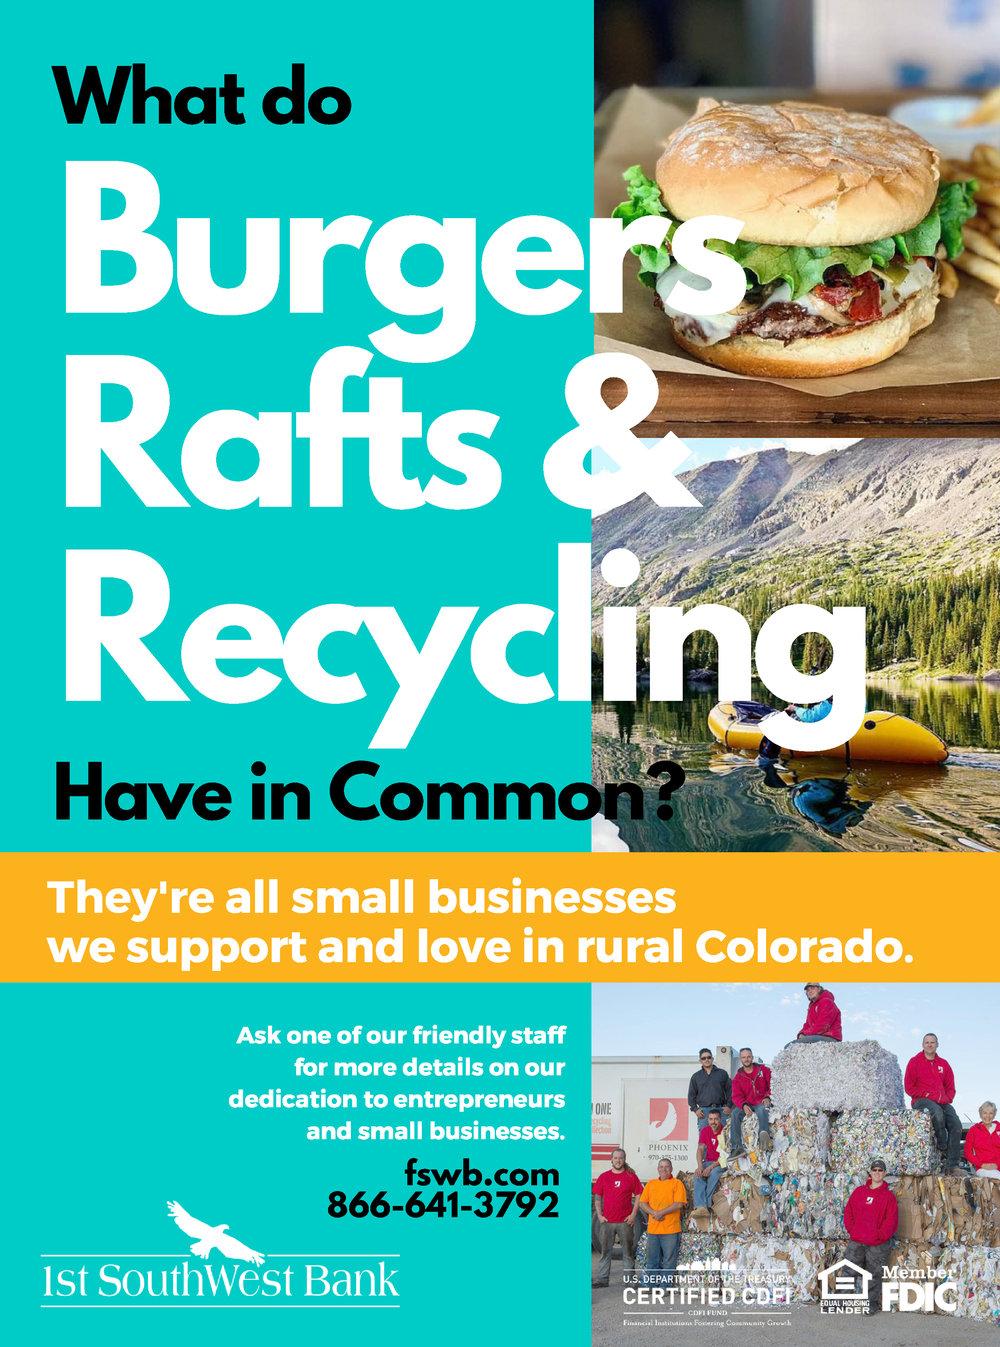 FSWB-BurgersRafts & Recycling-TheGulch.jpg